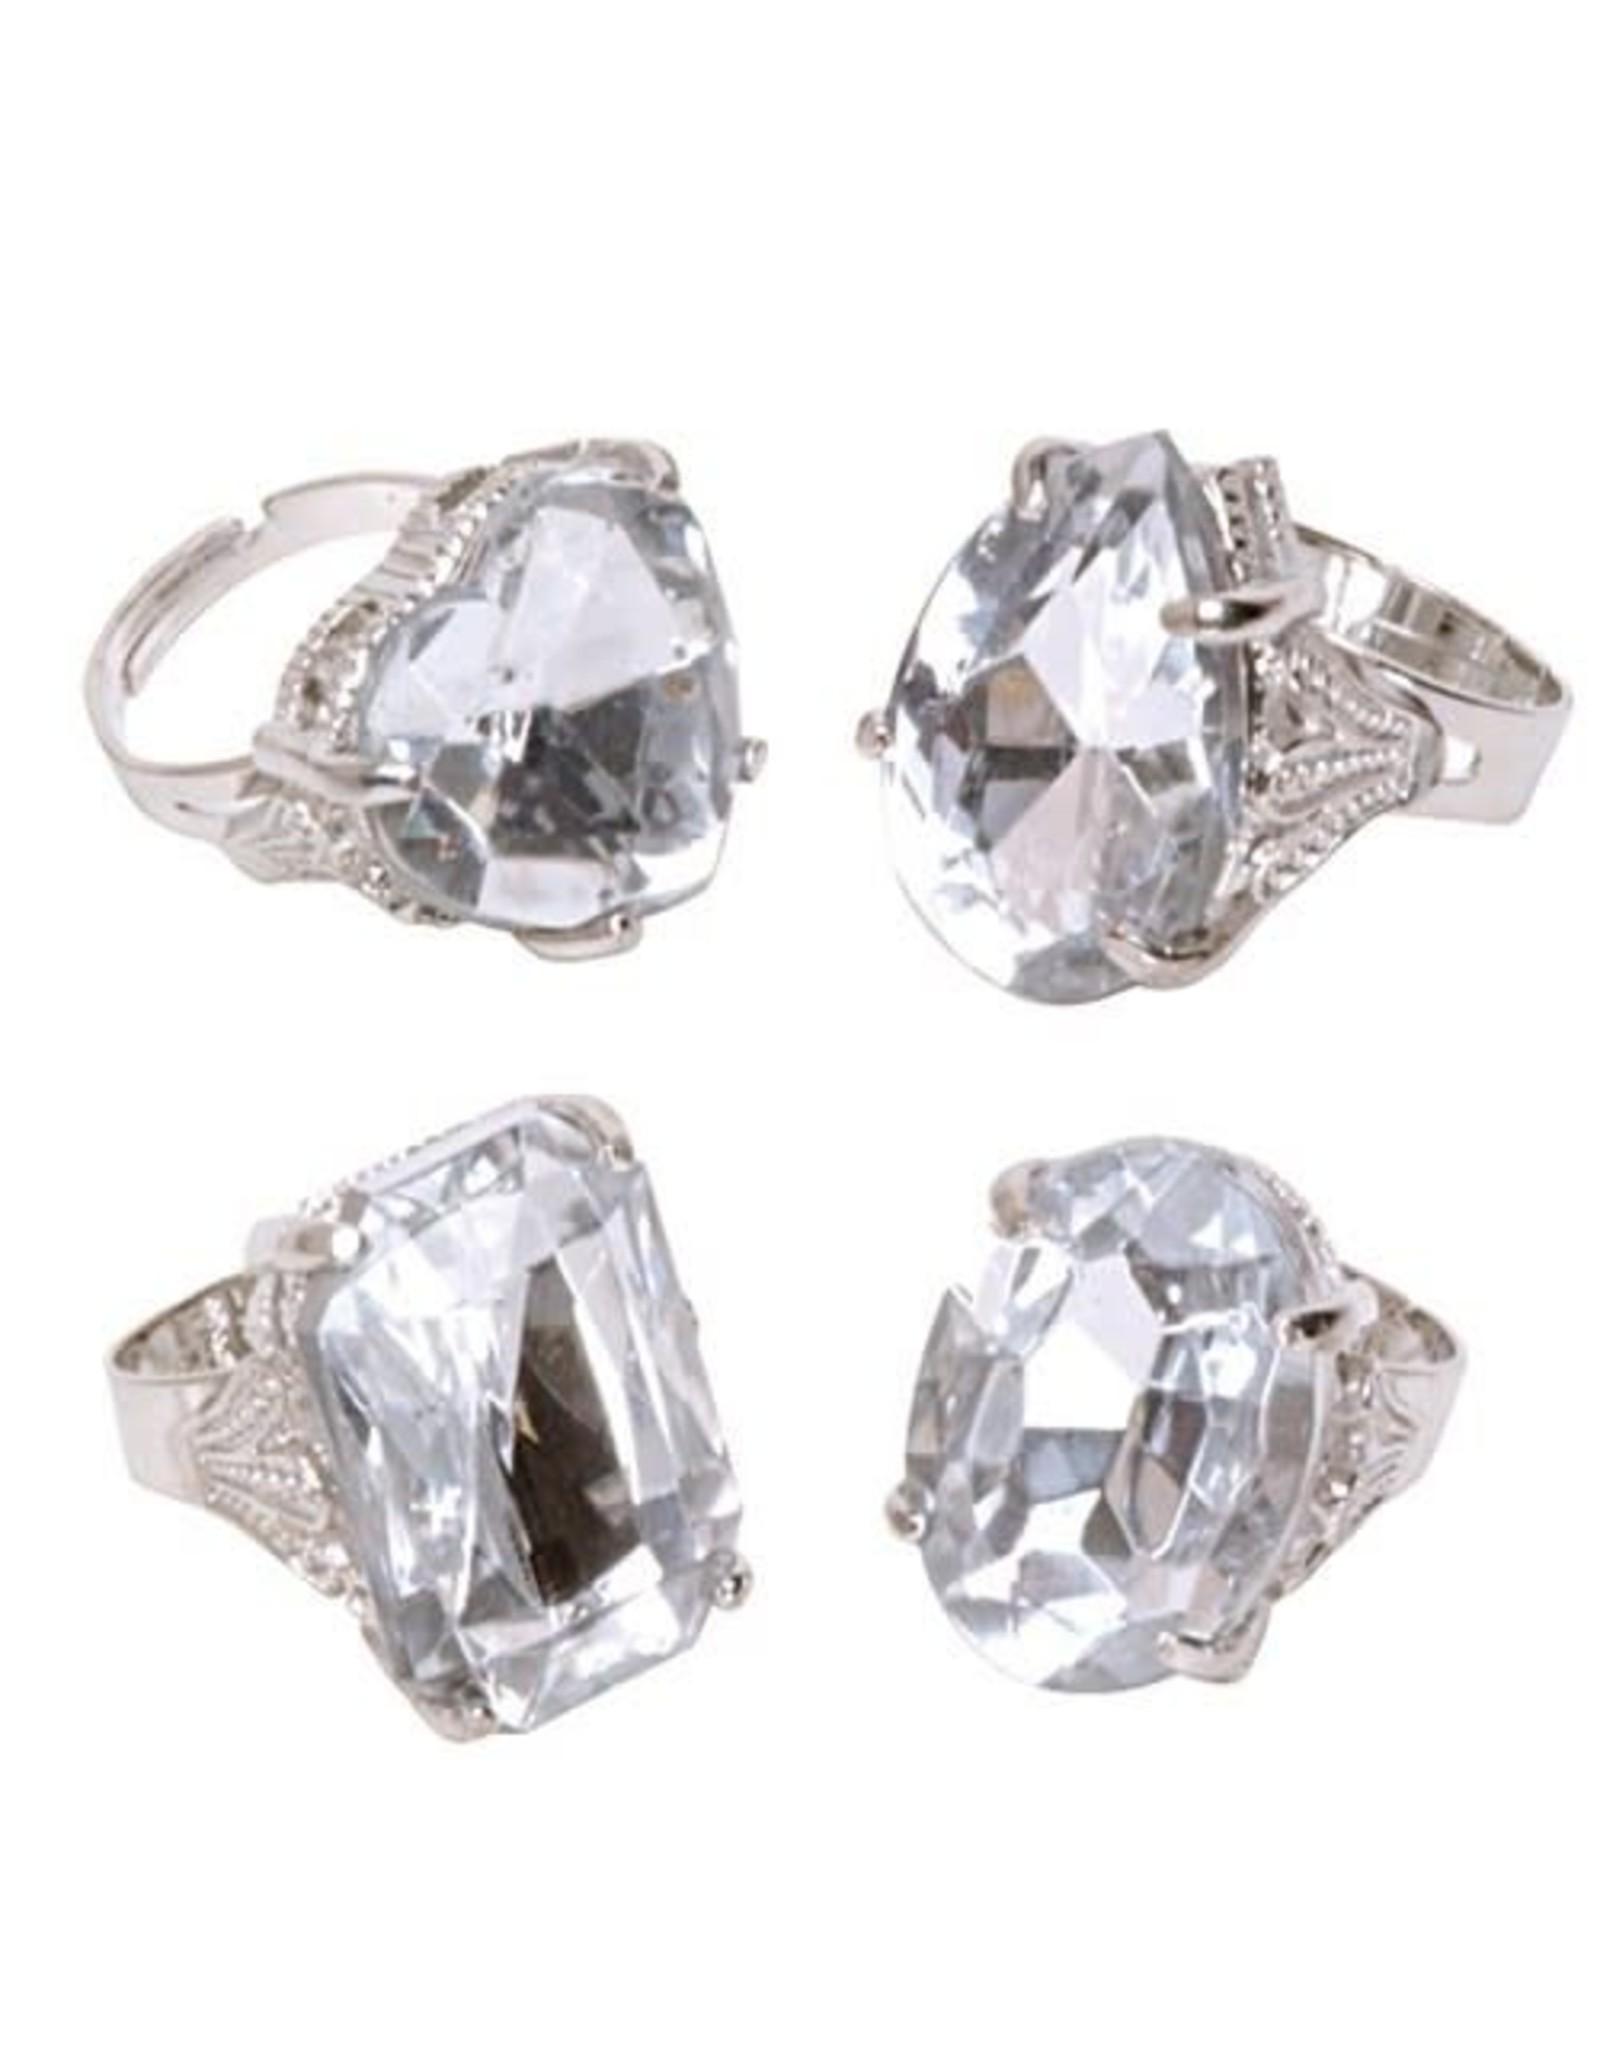 Dillon Diamond Look Ring